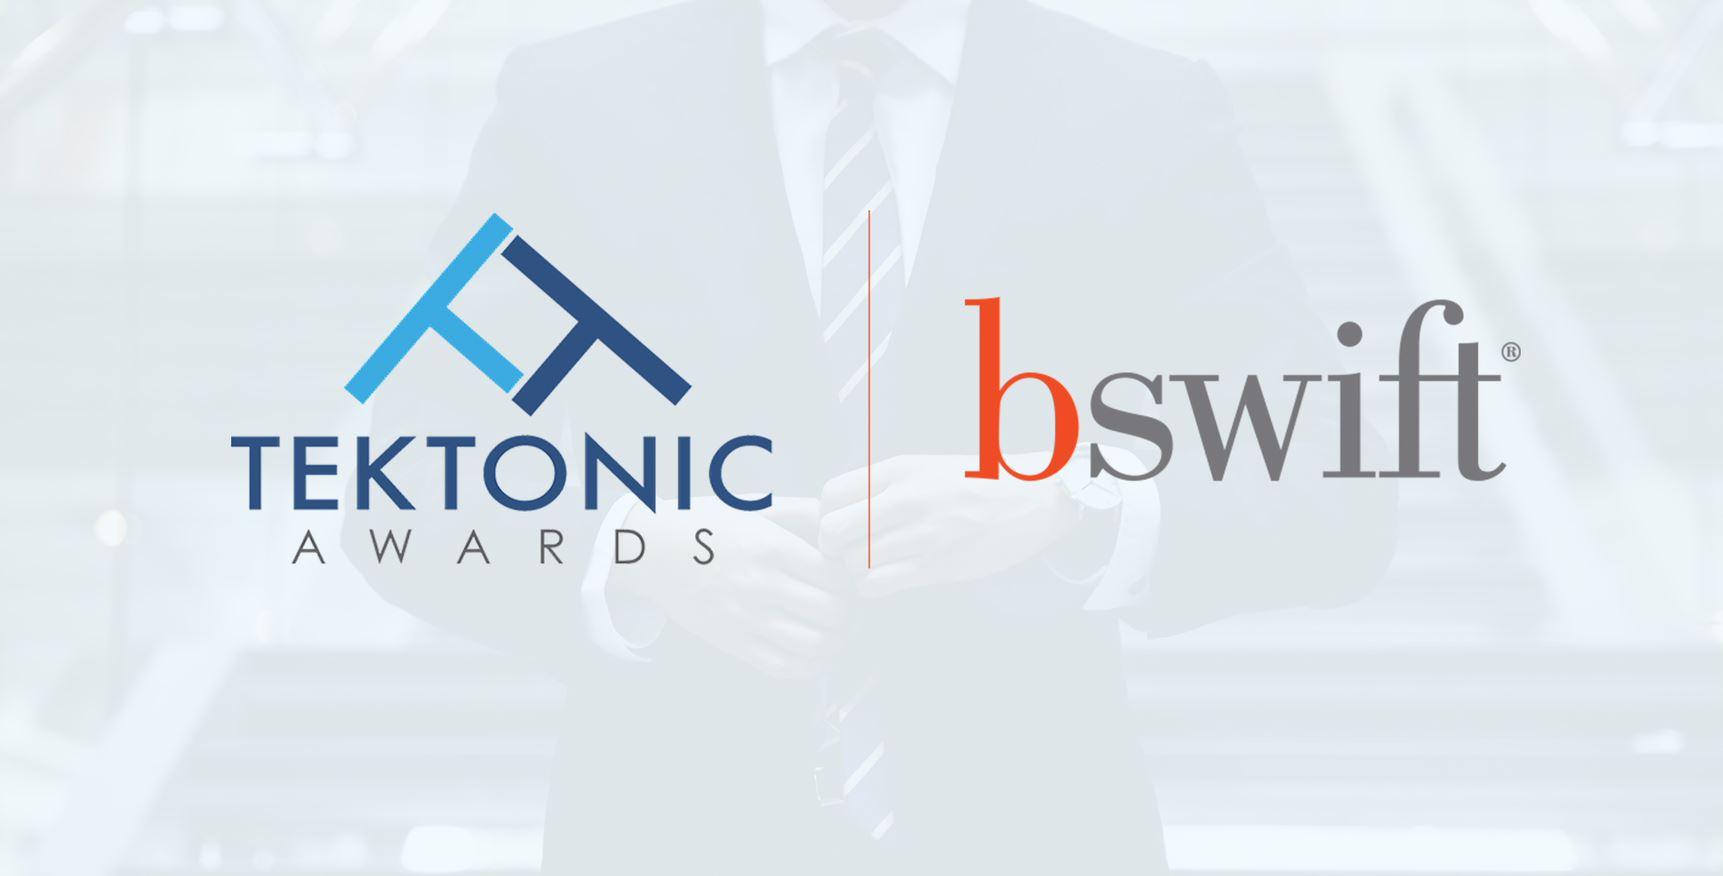 Tektonic Award Logo and bswift Logo